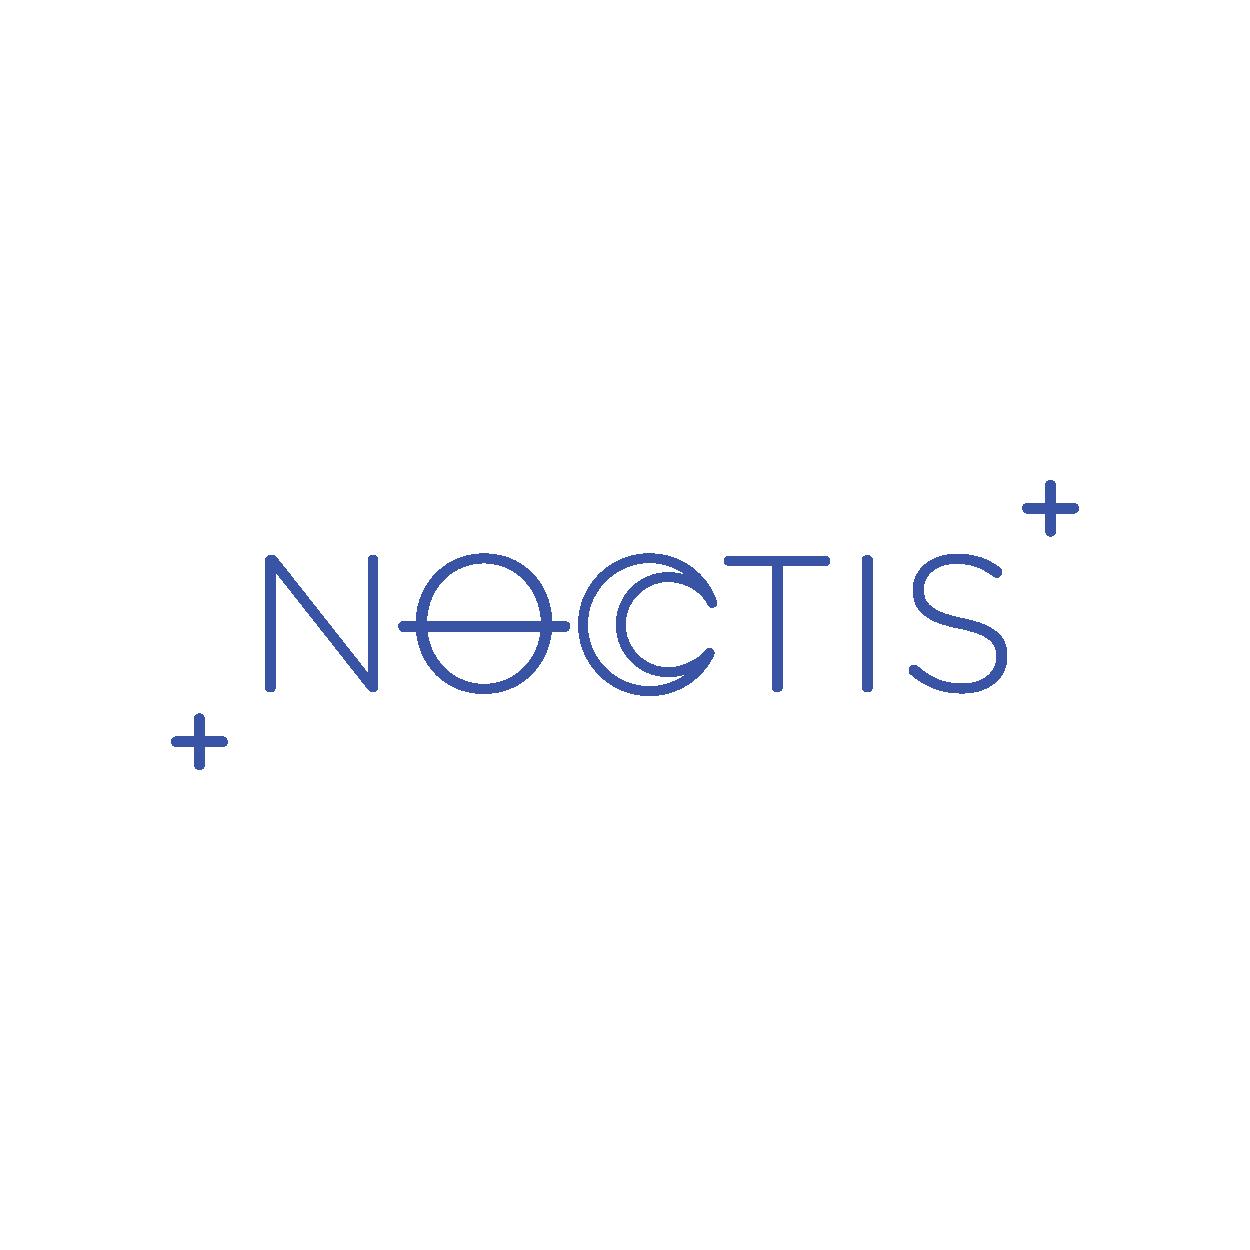 08-noctis2.png